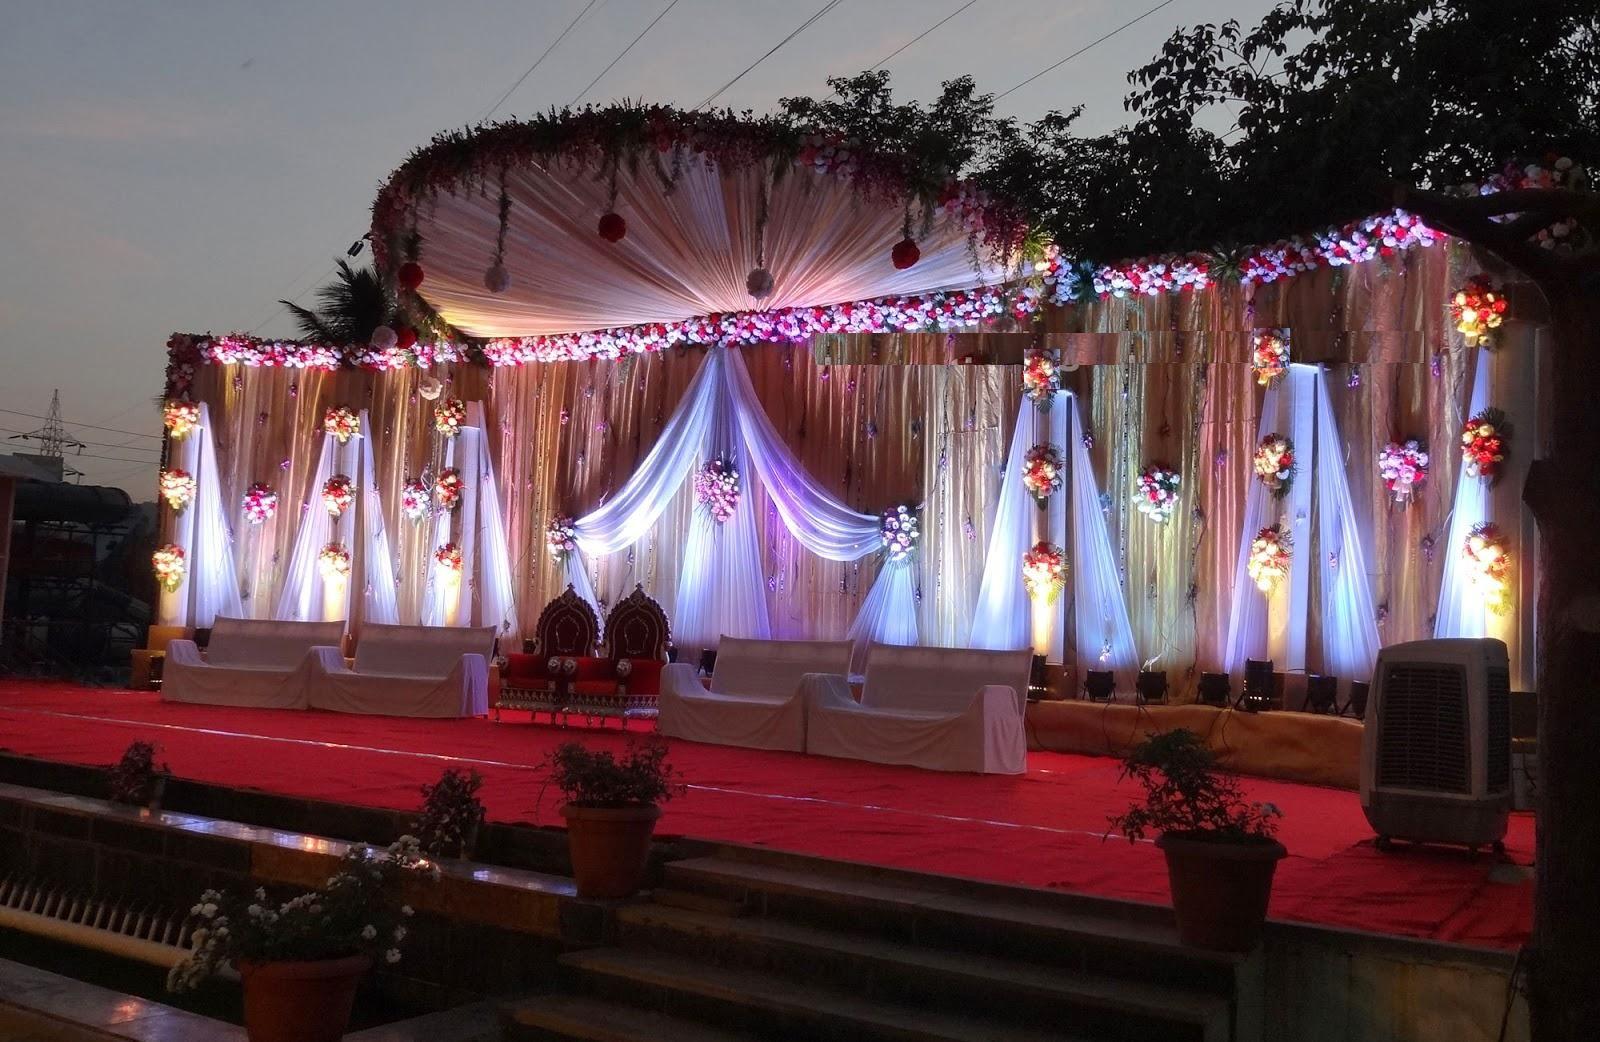 1 evening wedding stage decoration idea in garden rb group 1 evening wedding stage decoration idea in garden junglespirit Image collections